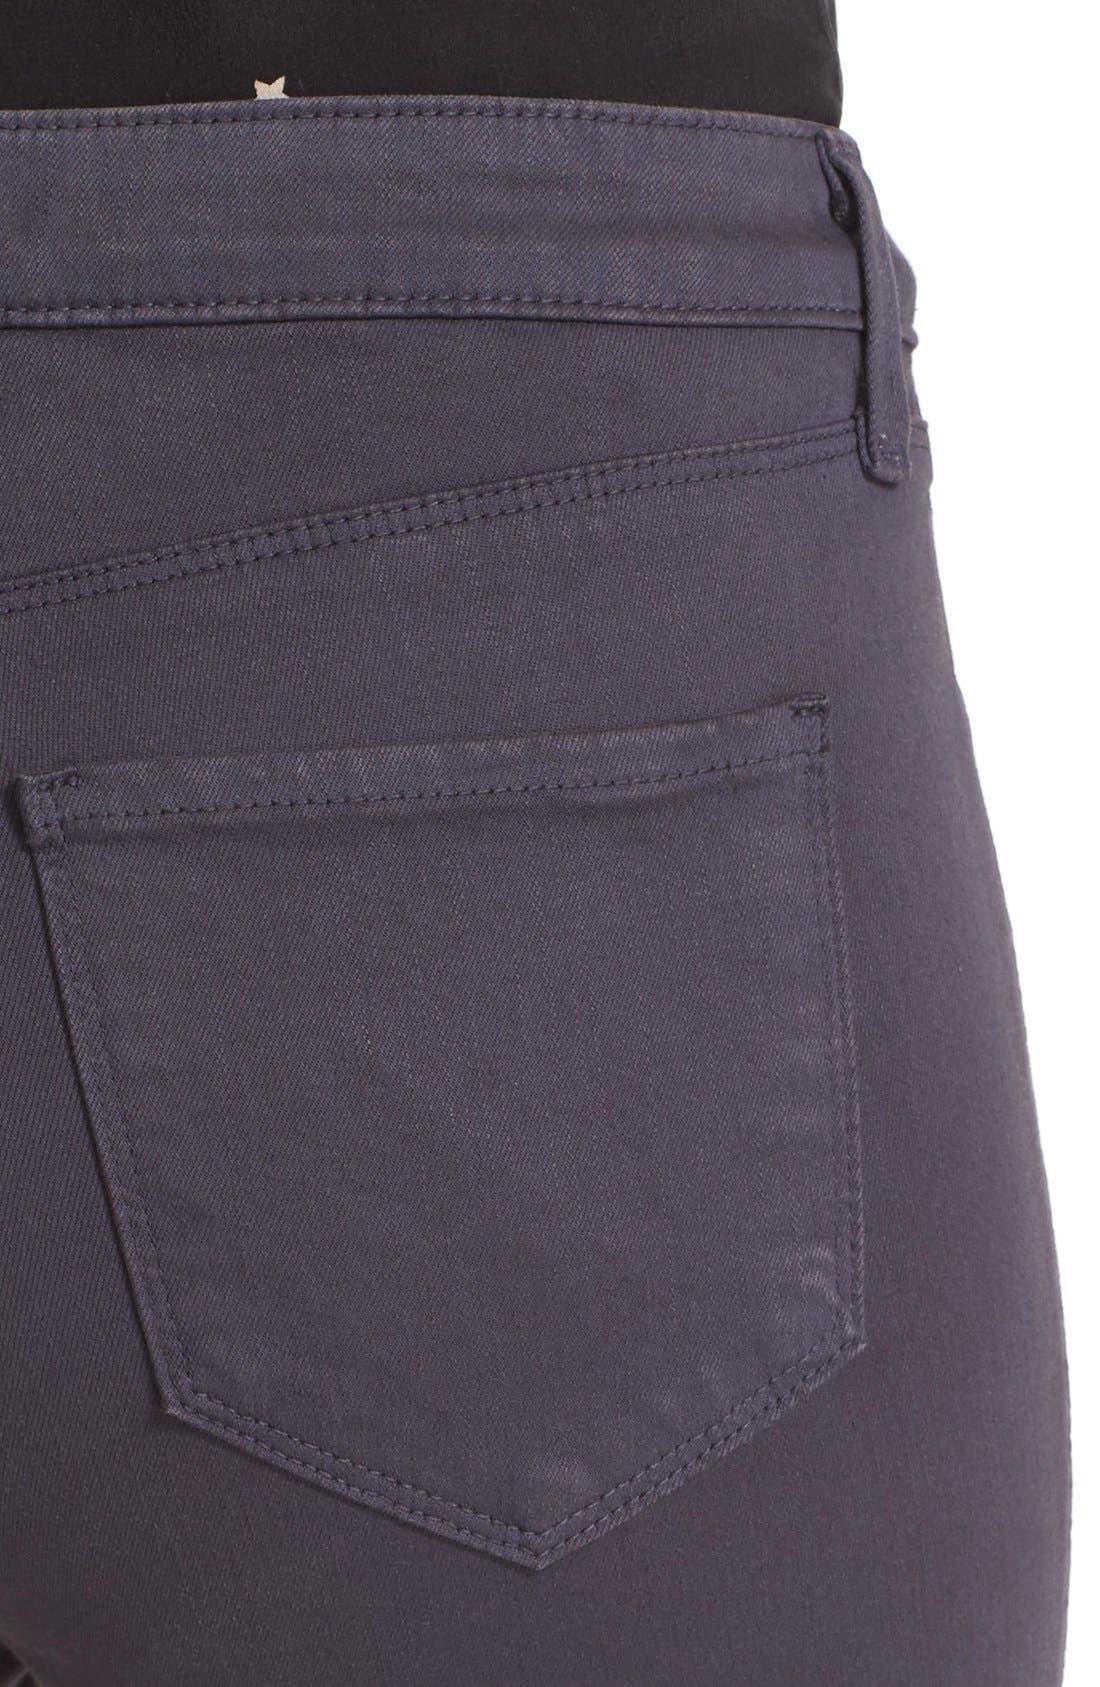 High Waist Skinny Ankle Jeans,                             Alternate thumbnail 5, color,                             Stingray